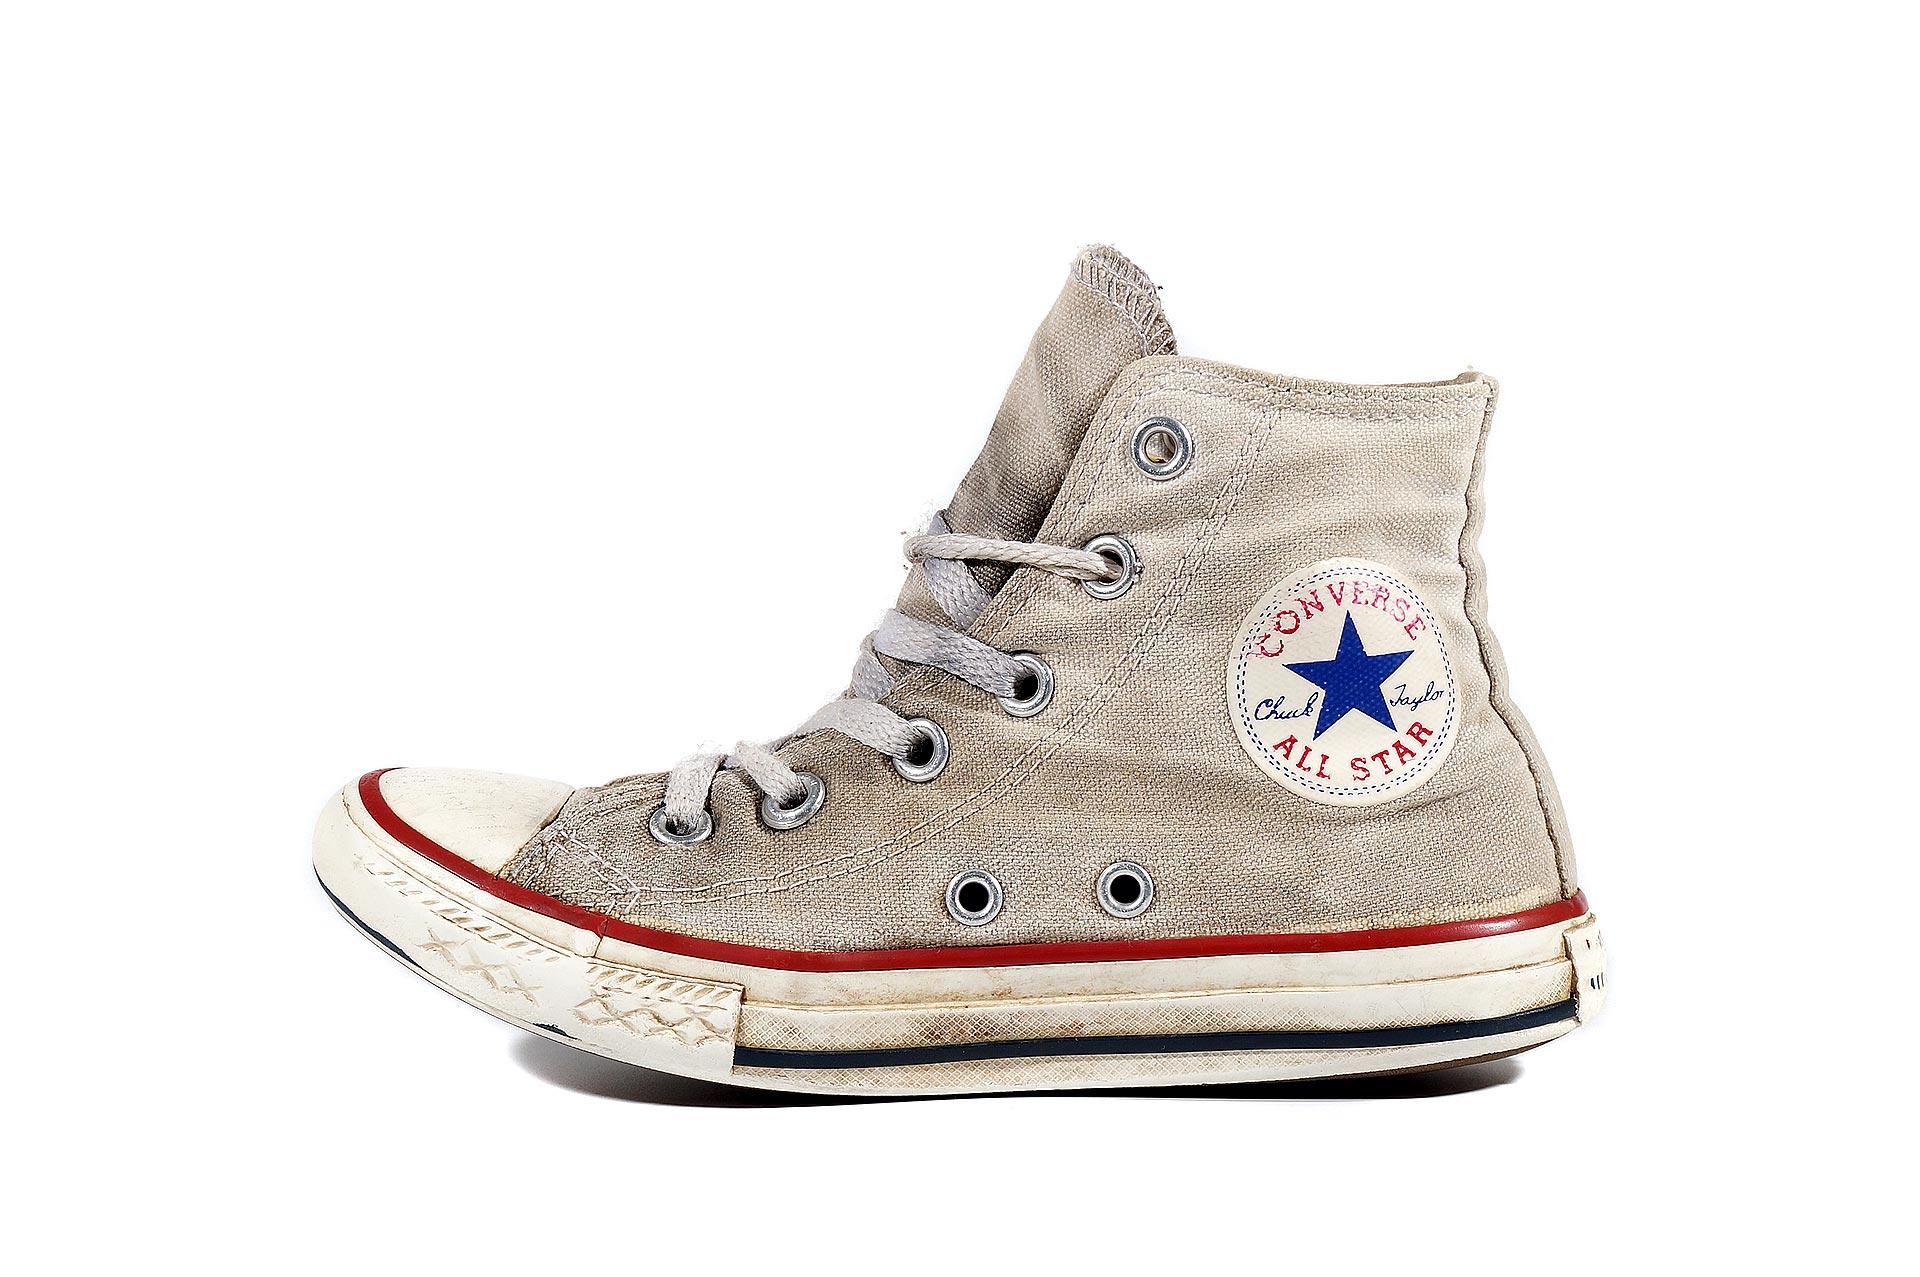 de69e8bab6f Converse kids Chuck Taylor All Star 3J253 (00073-U) sneakers used buy online  shop vintageshoes.ru